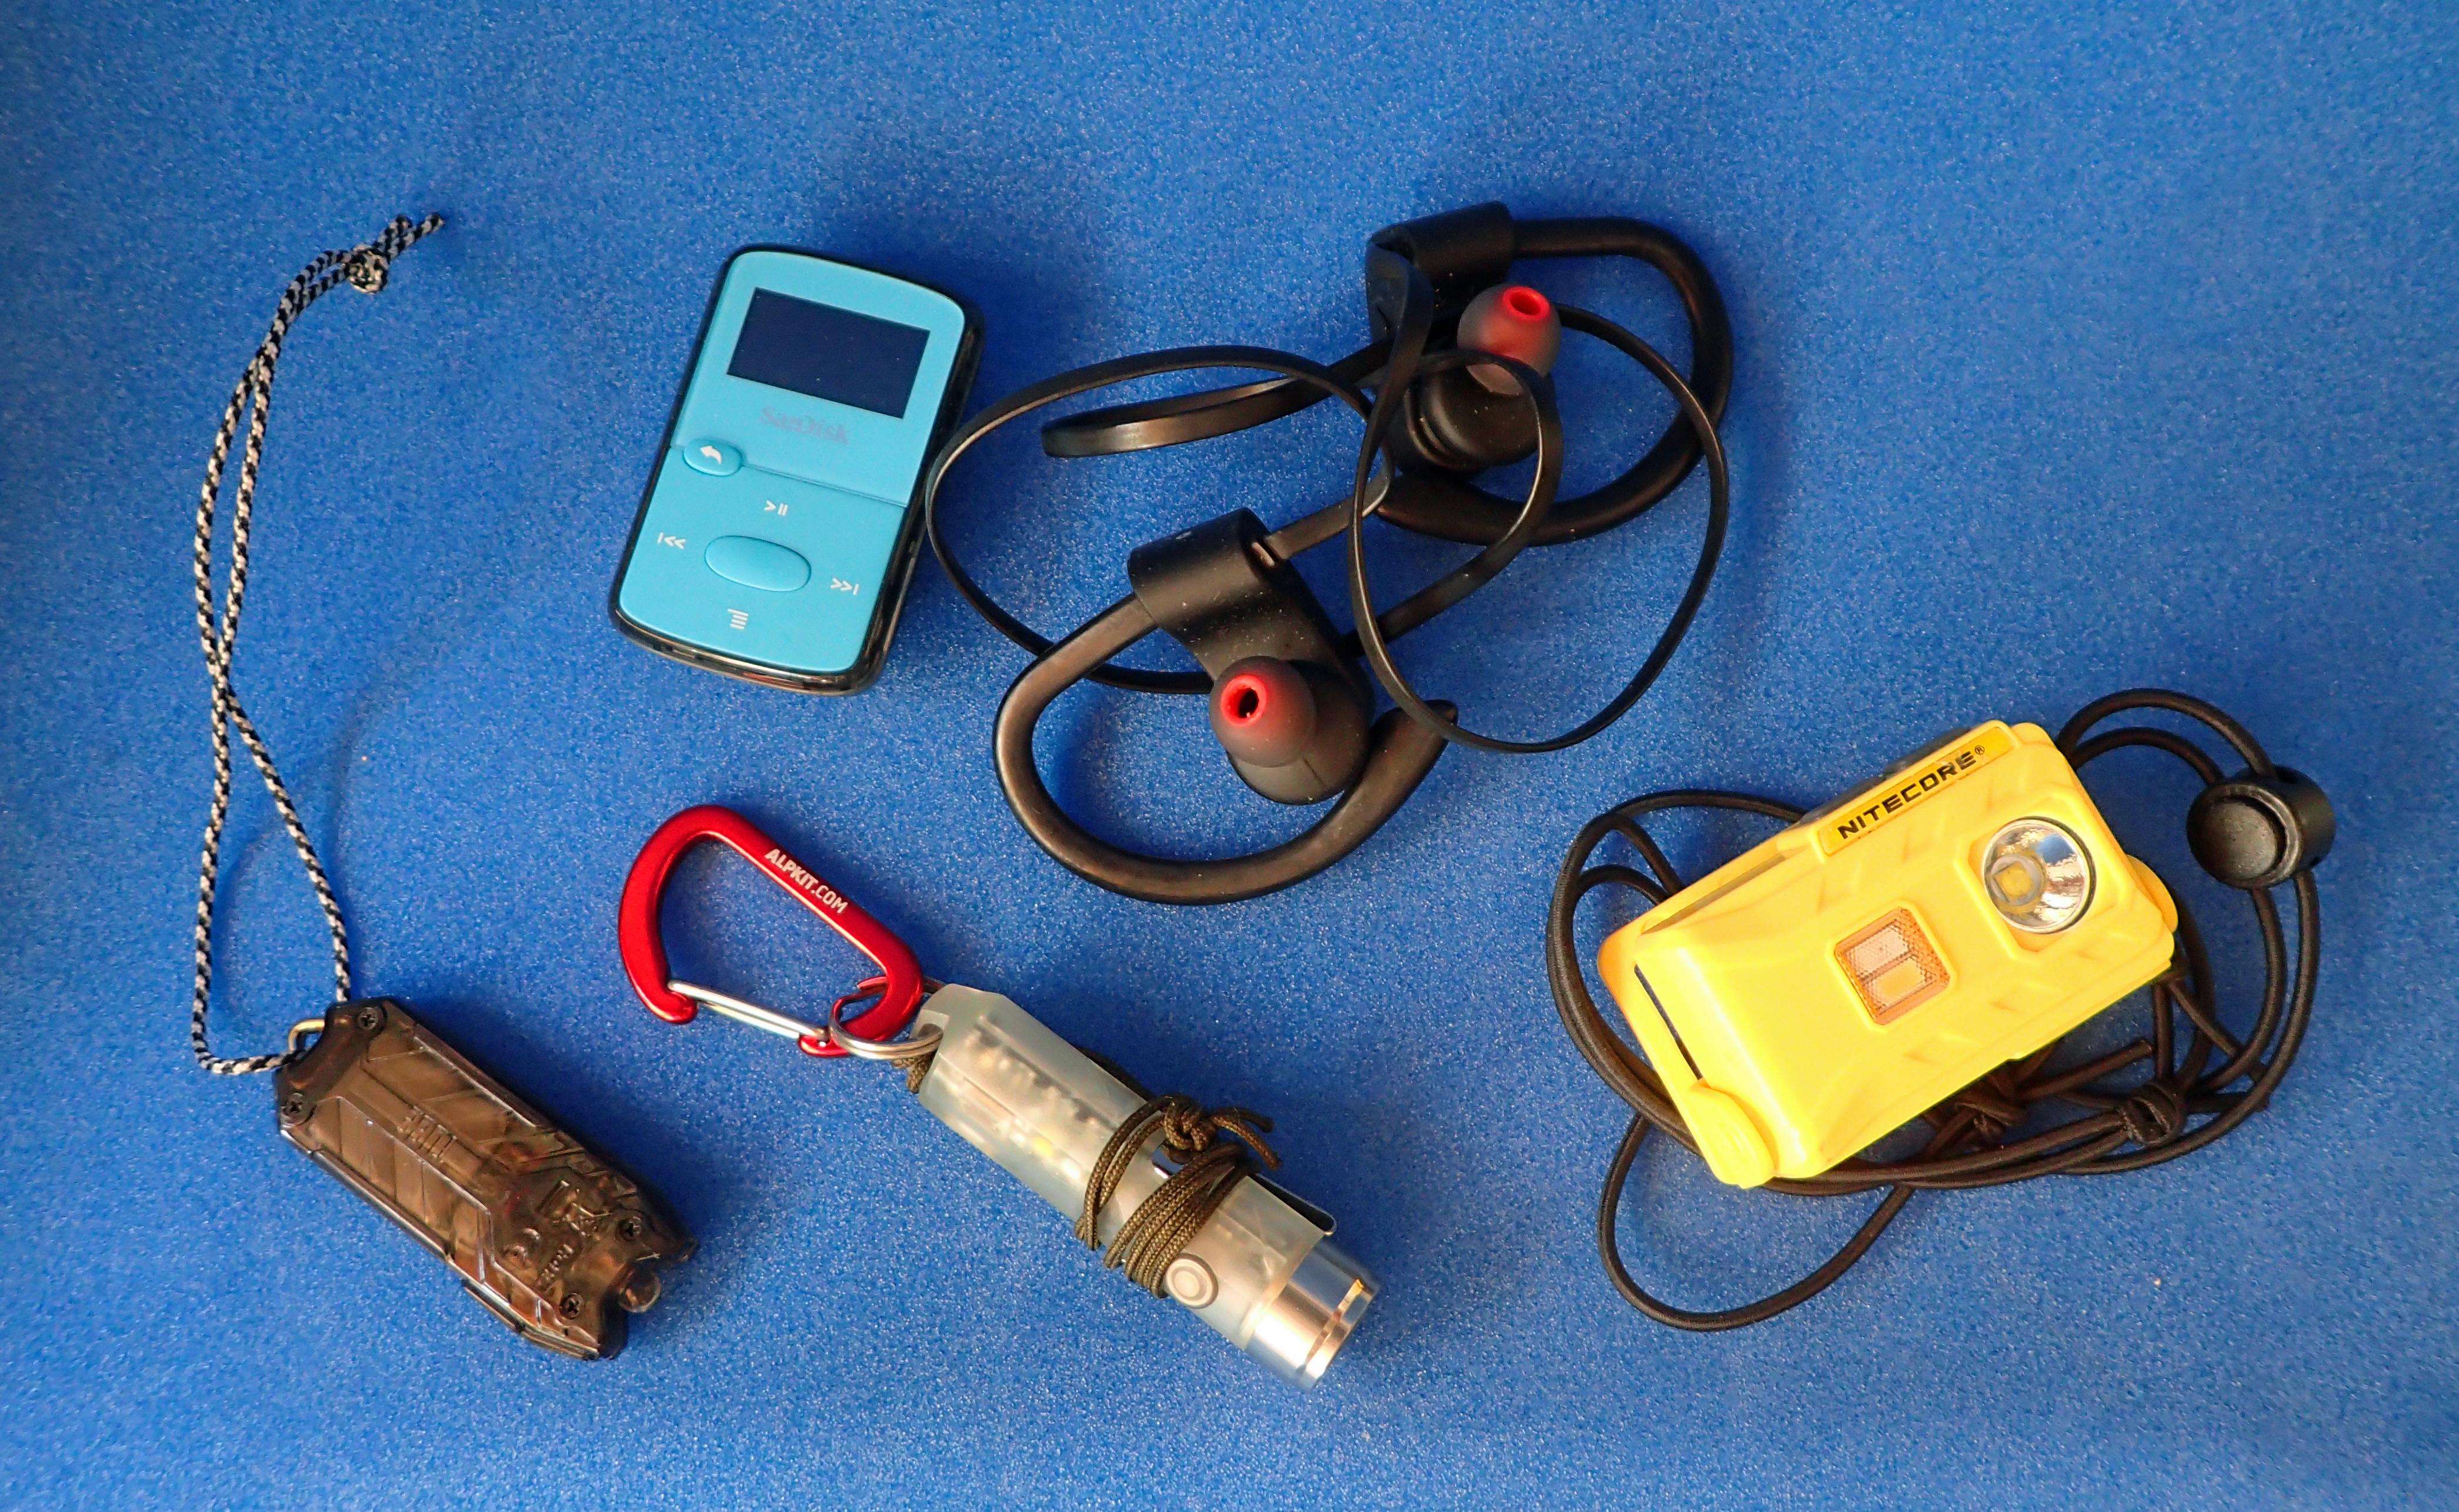 Smaller electronics